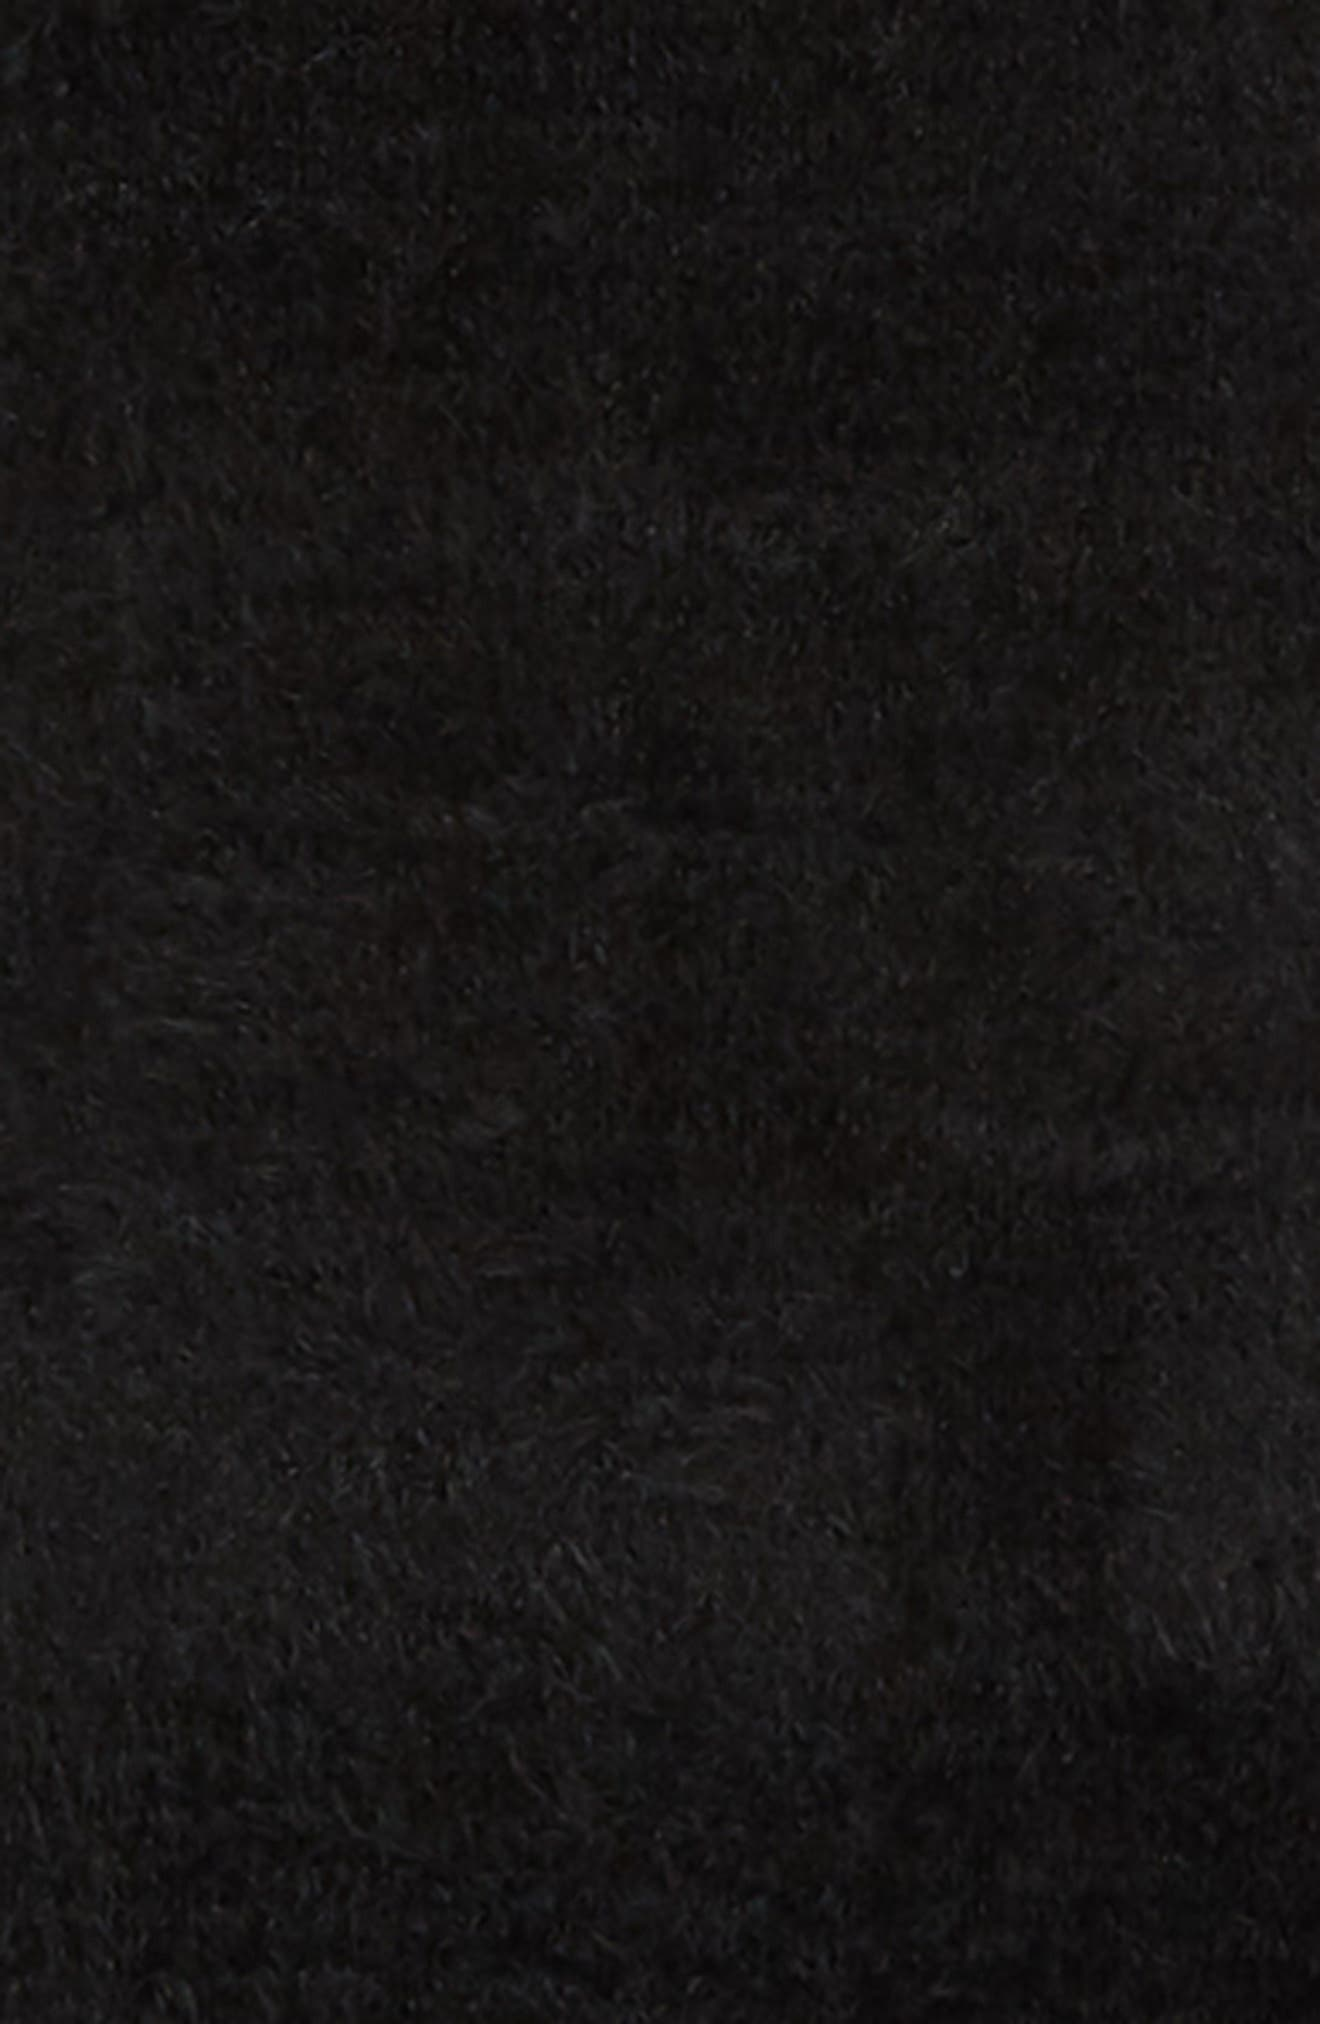 Eyleash Knit Muffler,                             Alternate thumbnail 4, color,                             BLACK